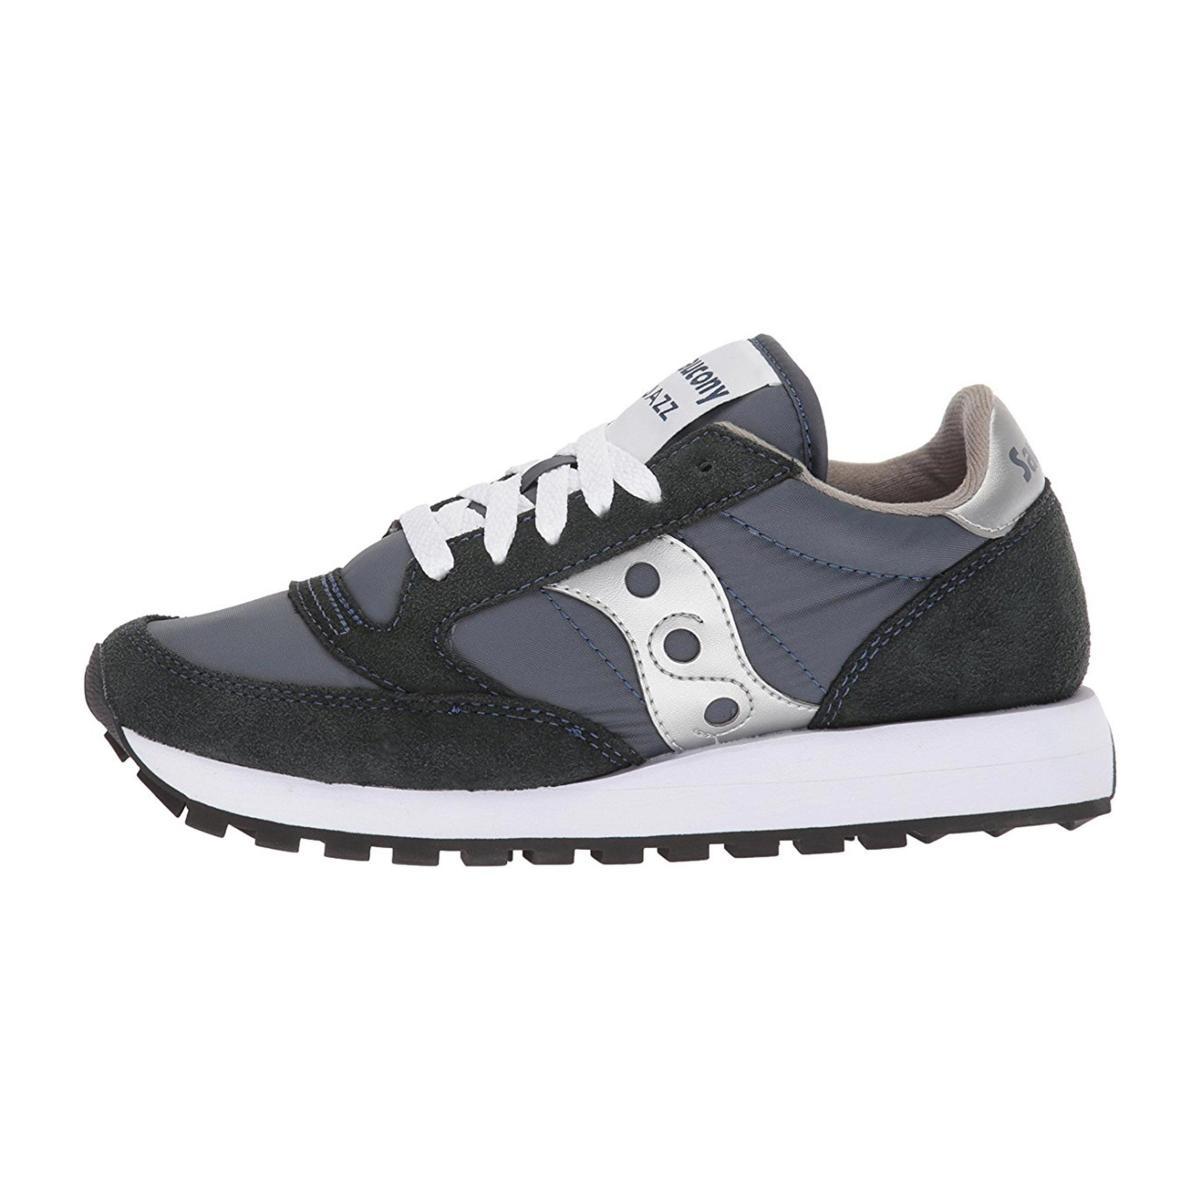 Scarpe Sneakers Saucony Jazz Original Donna Rif. 1044-2